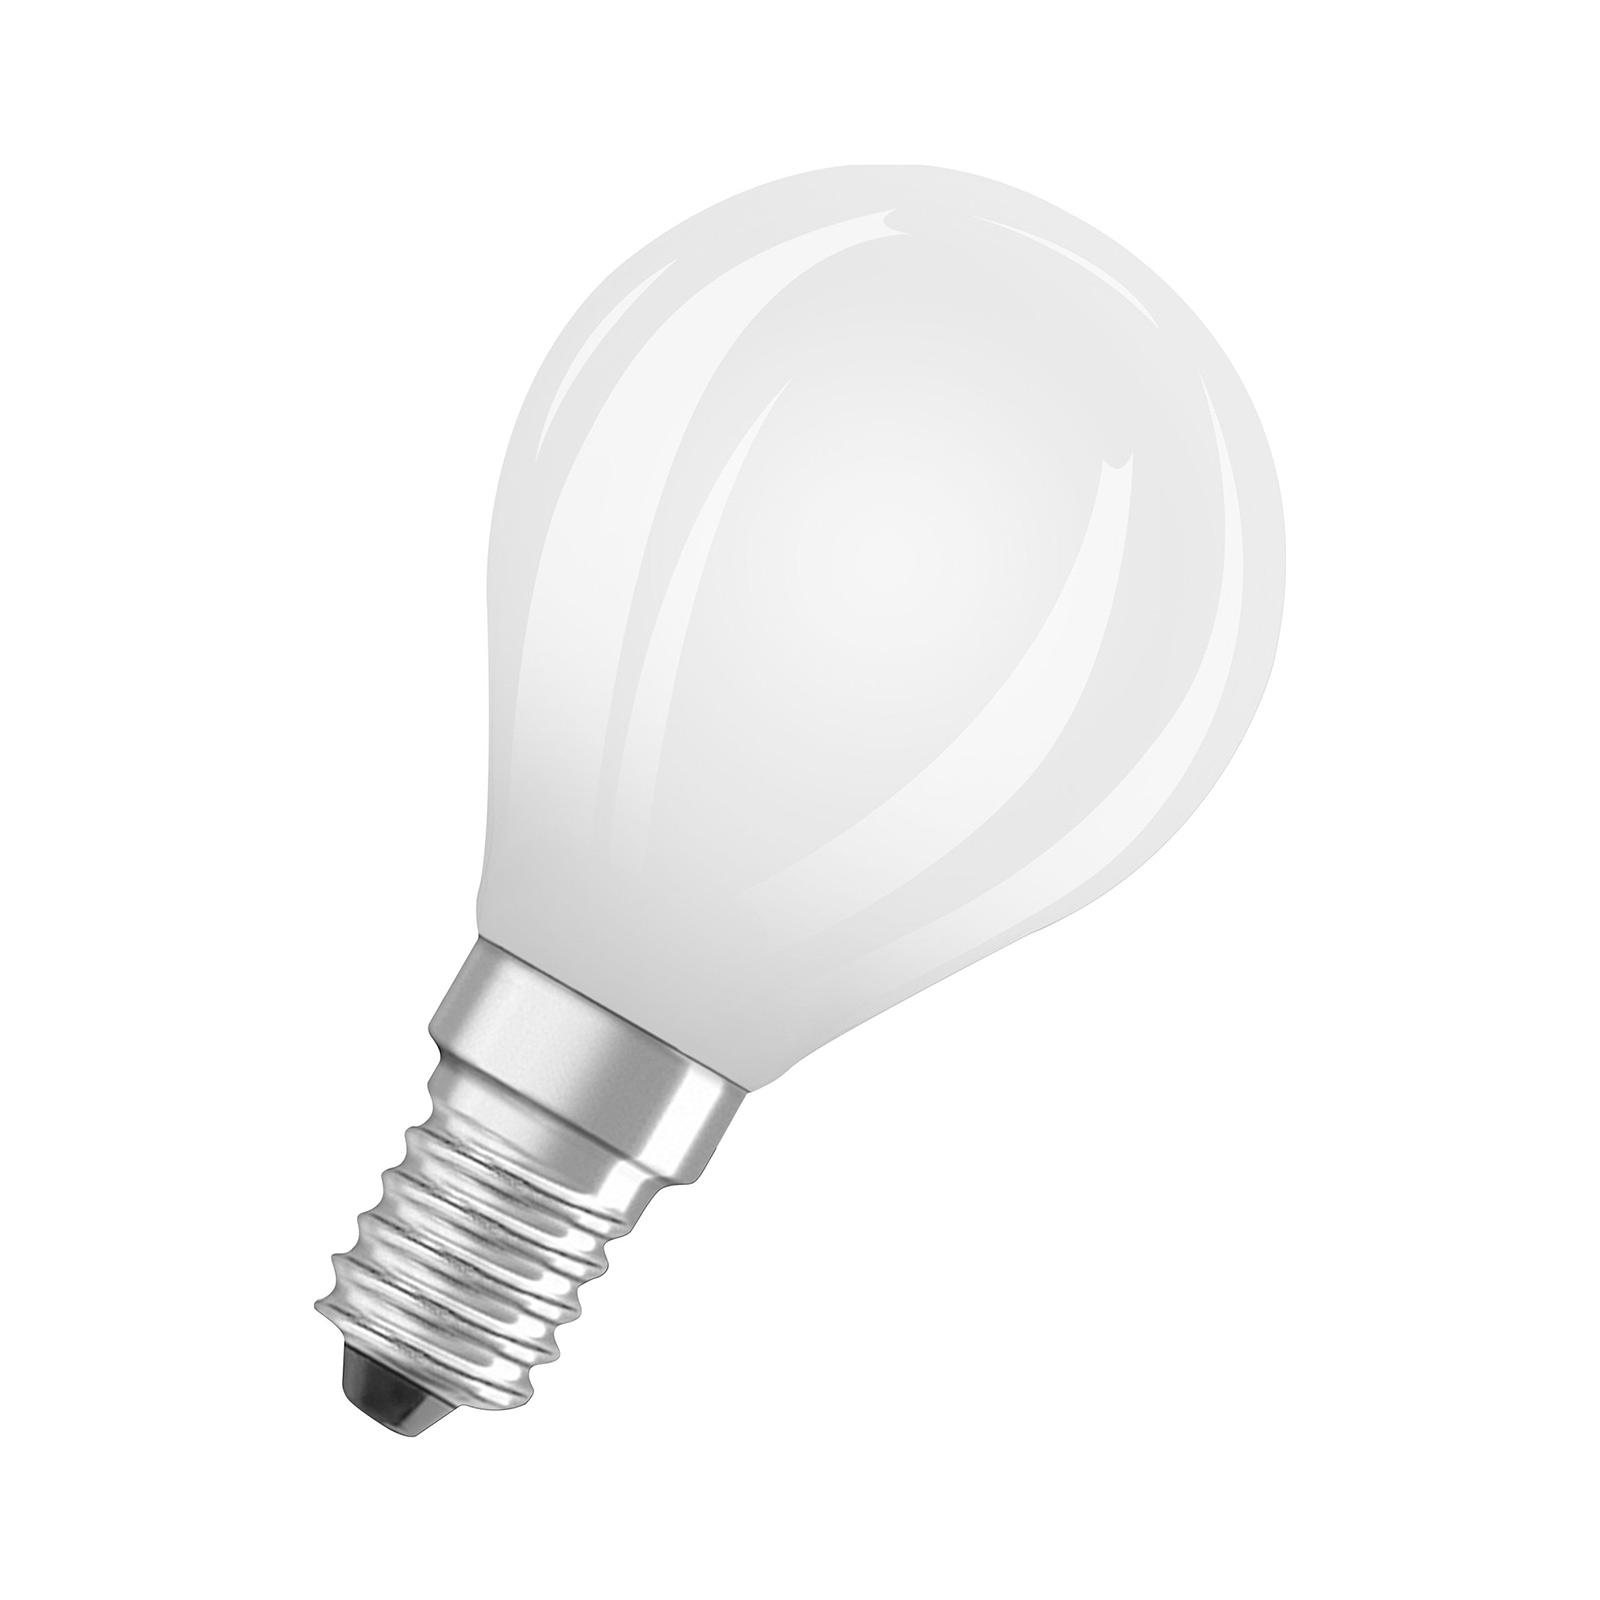 OSRAM LED-Tropfenlampe E14 6,5W 827 dimmbar matt